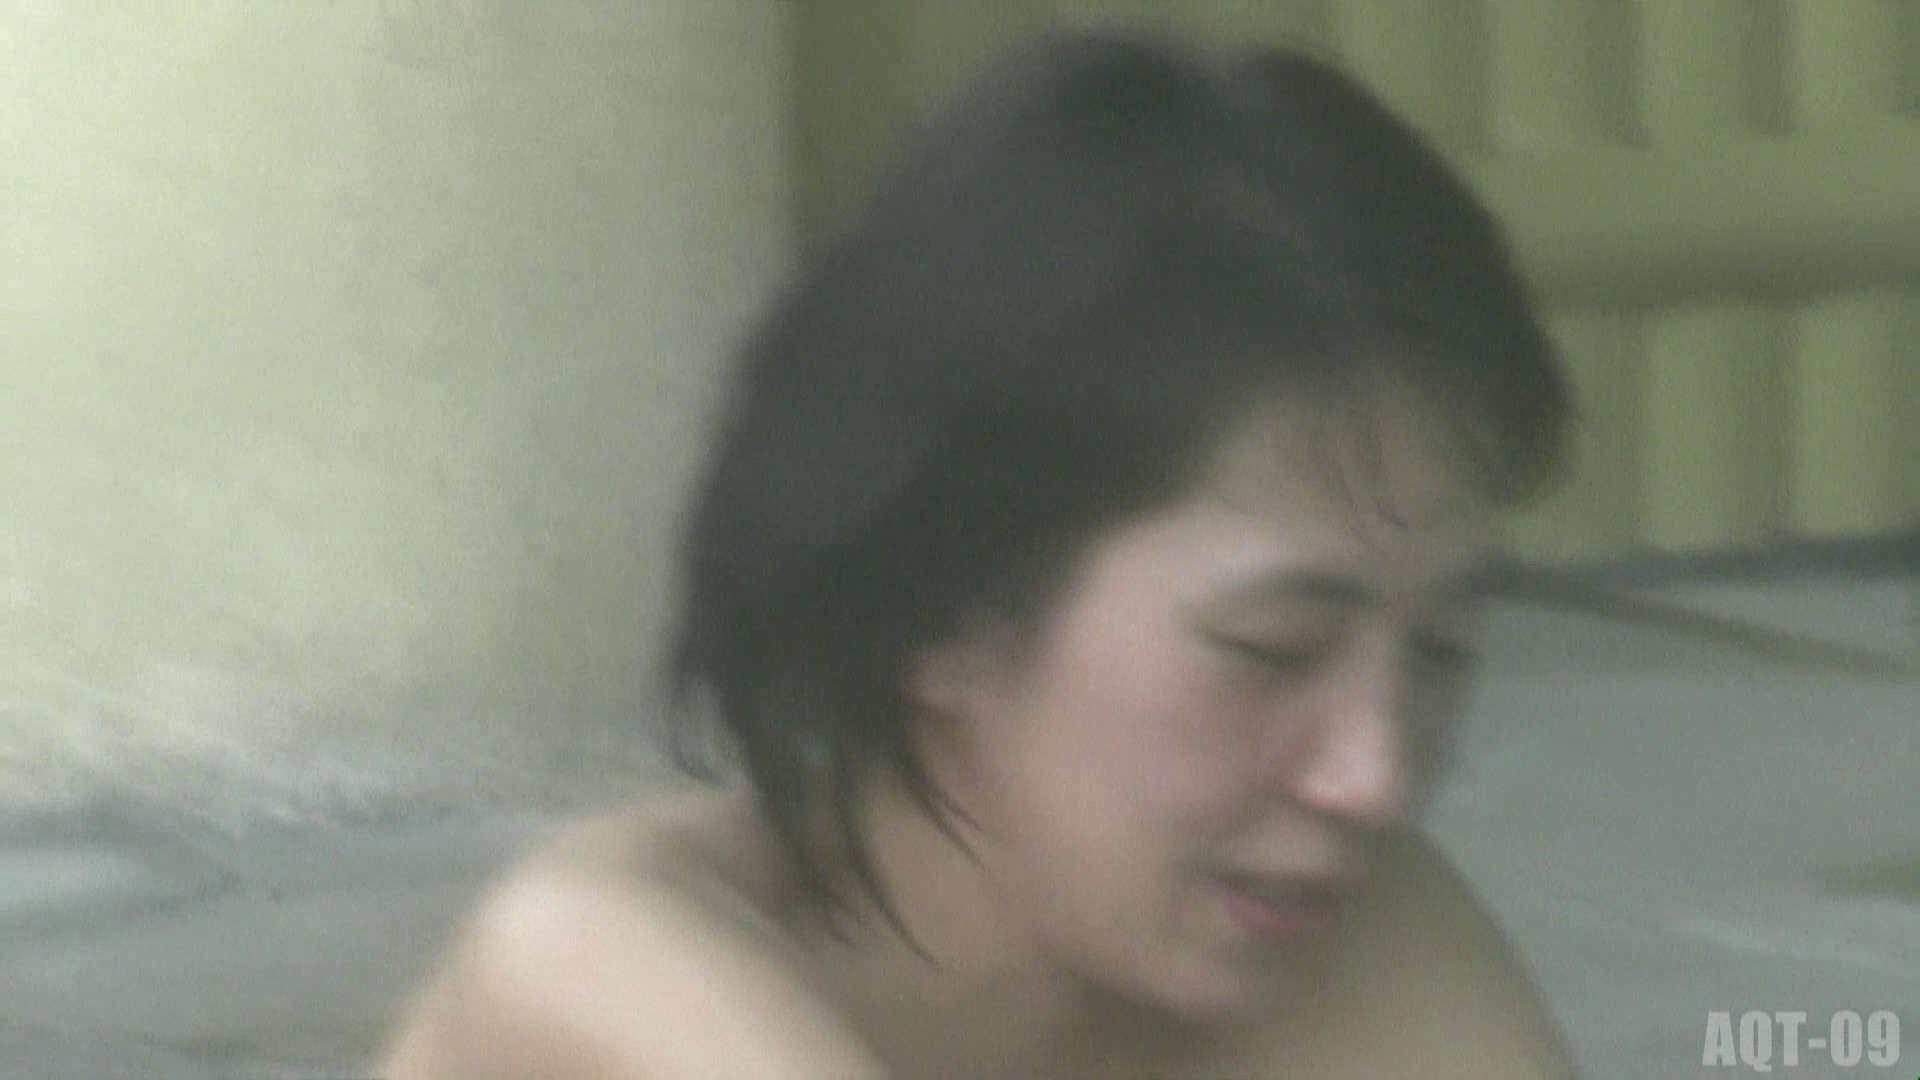 Aquaな露天風呂Vol.788 OL女体 セックス無修正動画無料 44連発 5